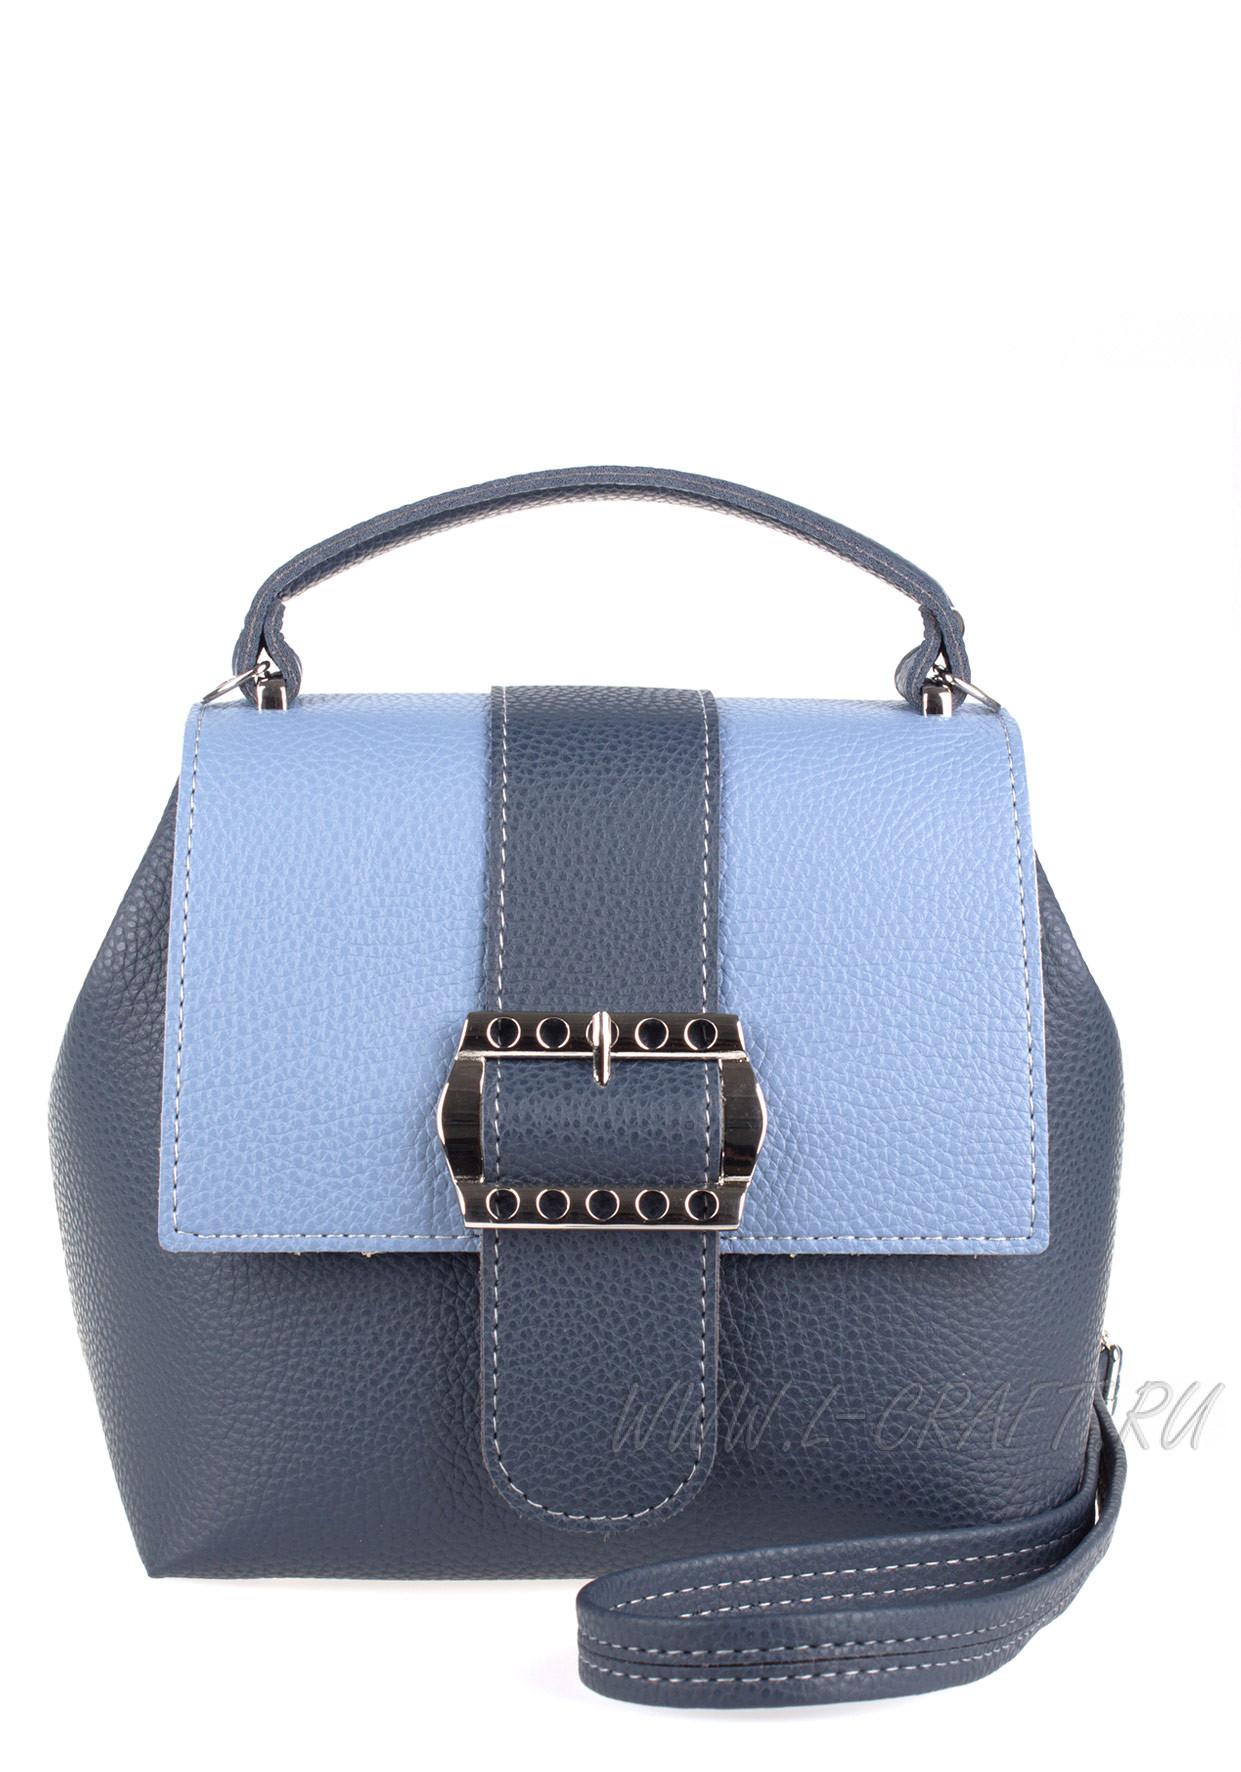 Модель №V139 | кожзам | гладкий | синий голубой | Р775-8 | 25608